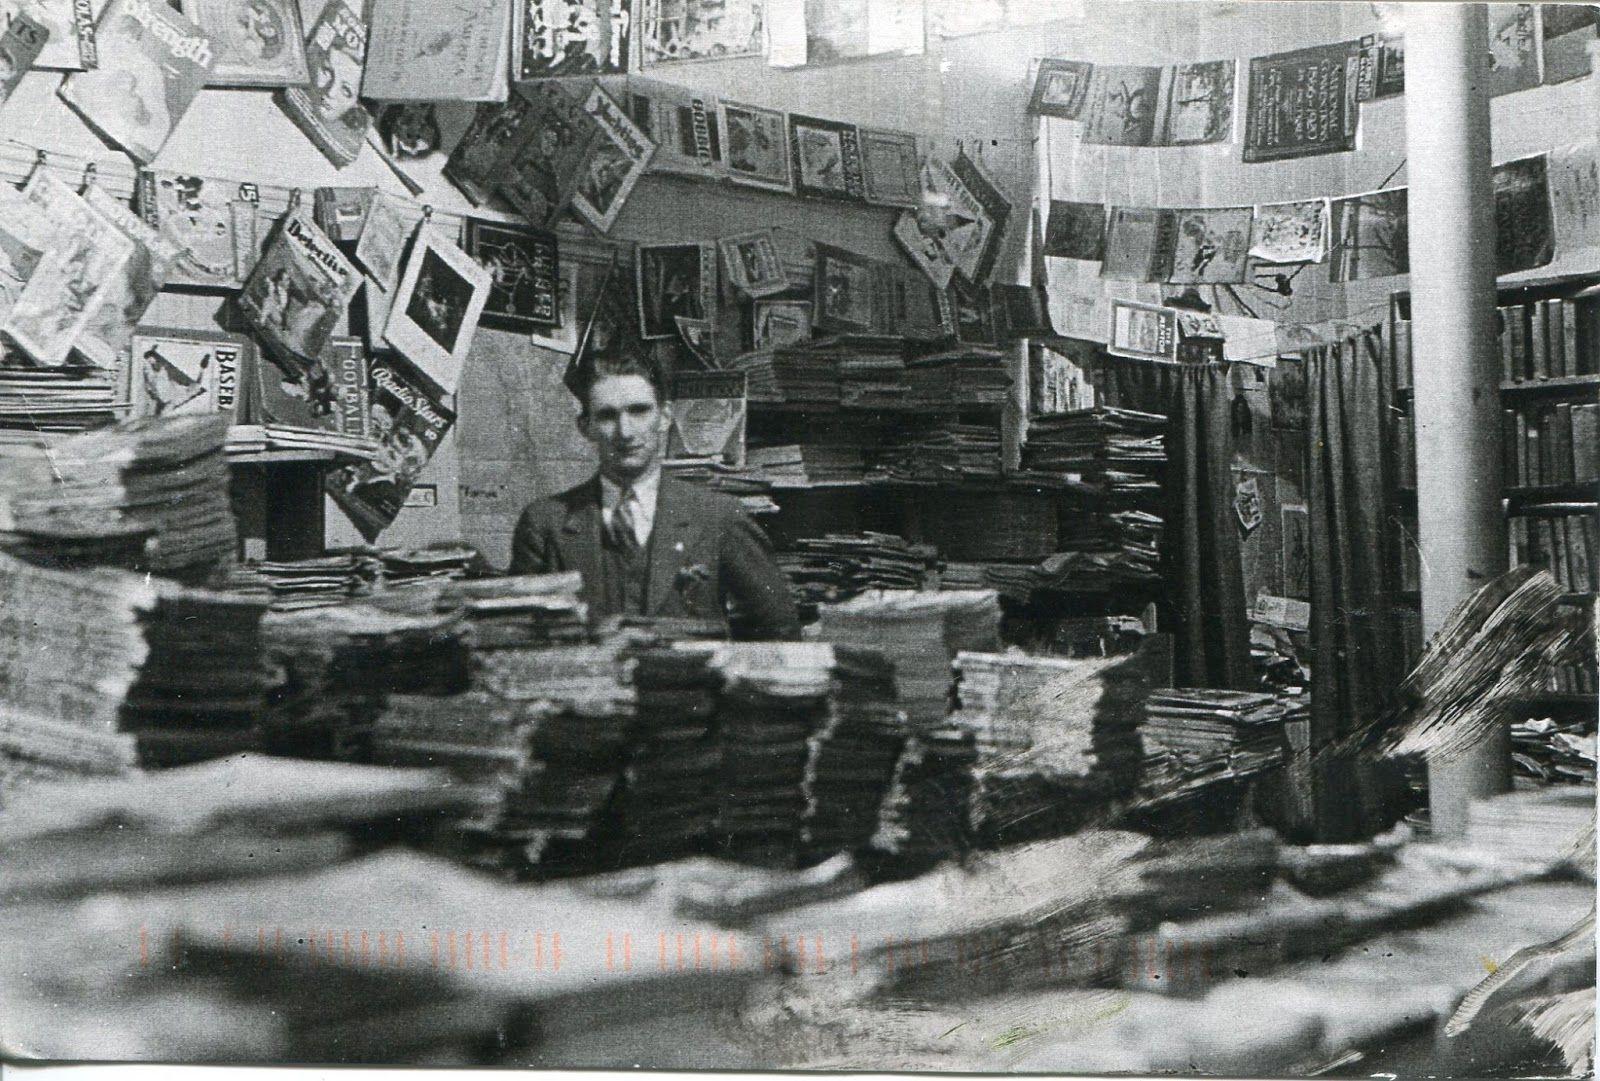 Stephen Willins, Proprietor / Oceans of Books by the Sea / Wellfleet, MA (1934)